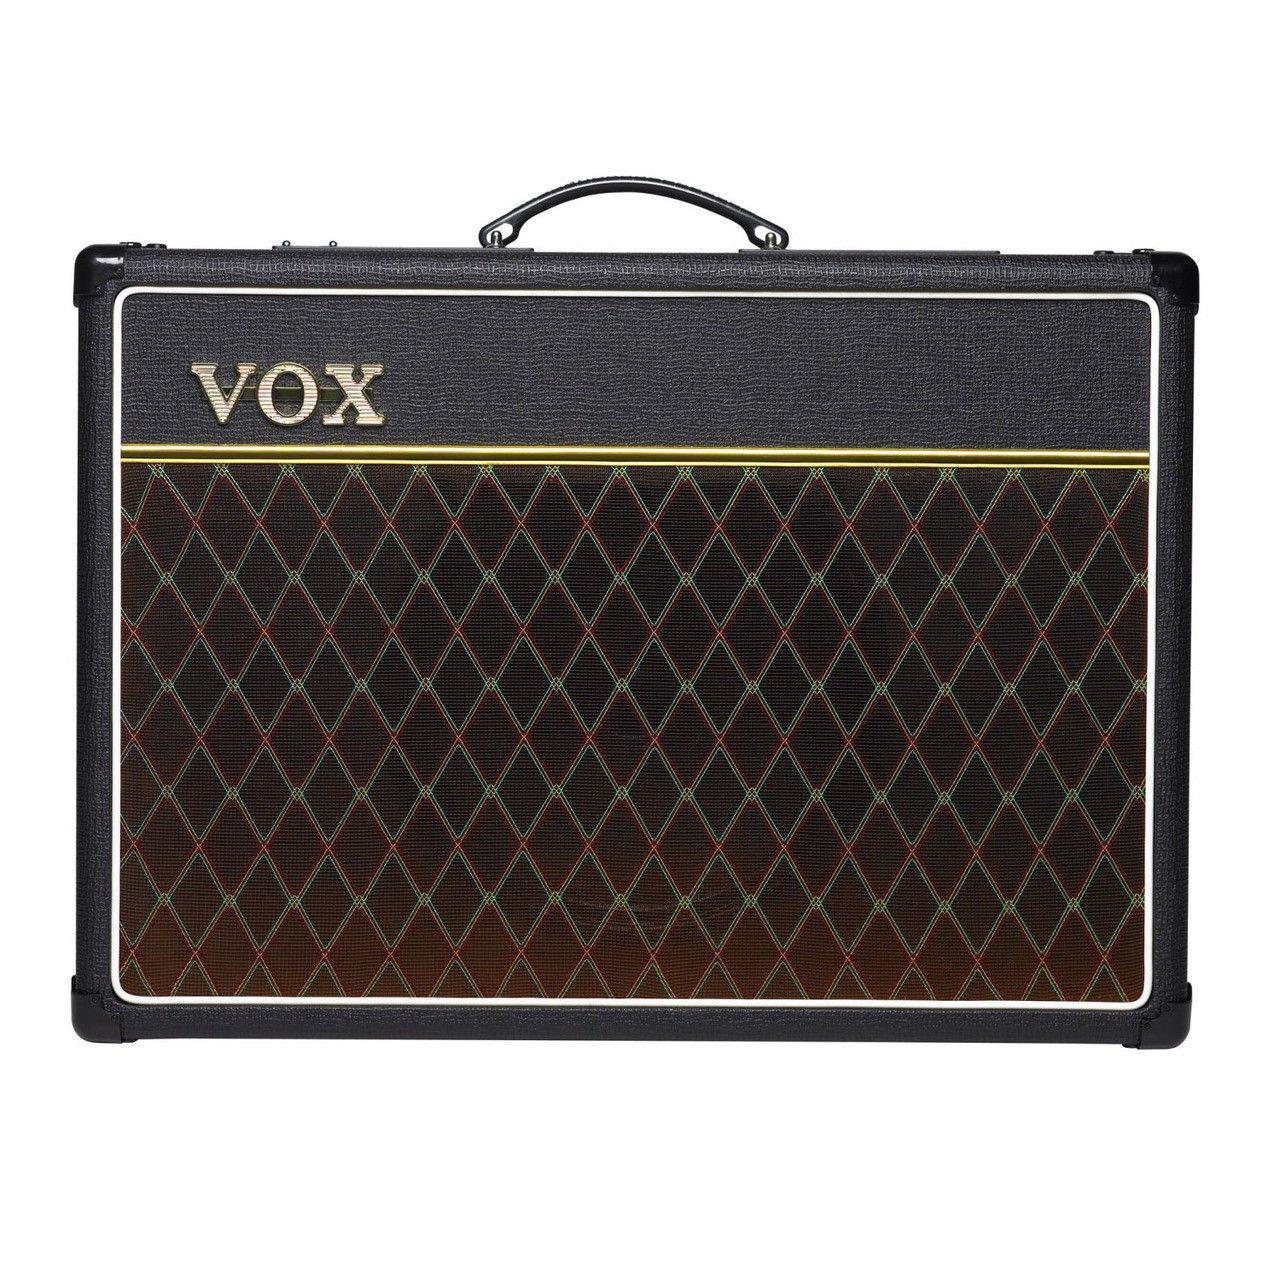 Vox AC15C1 Custom 1x12 15W Combo Amp - Black